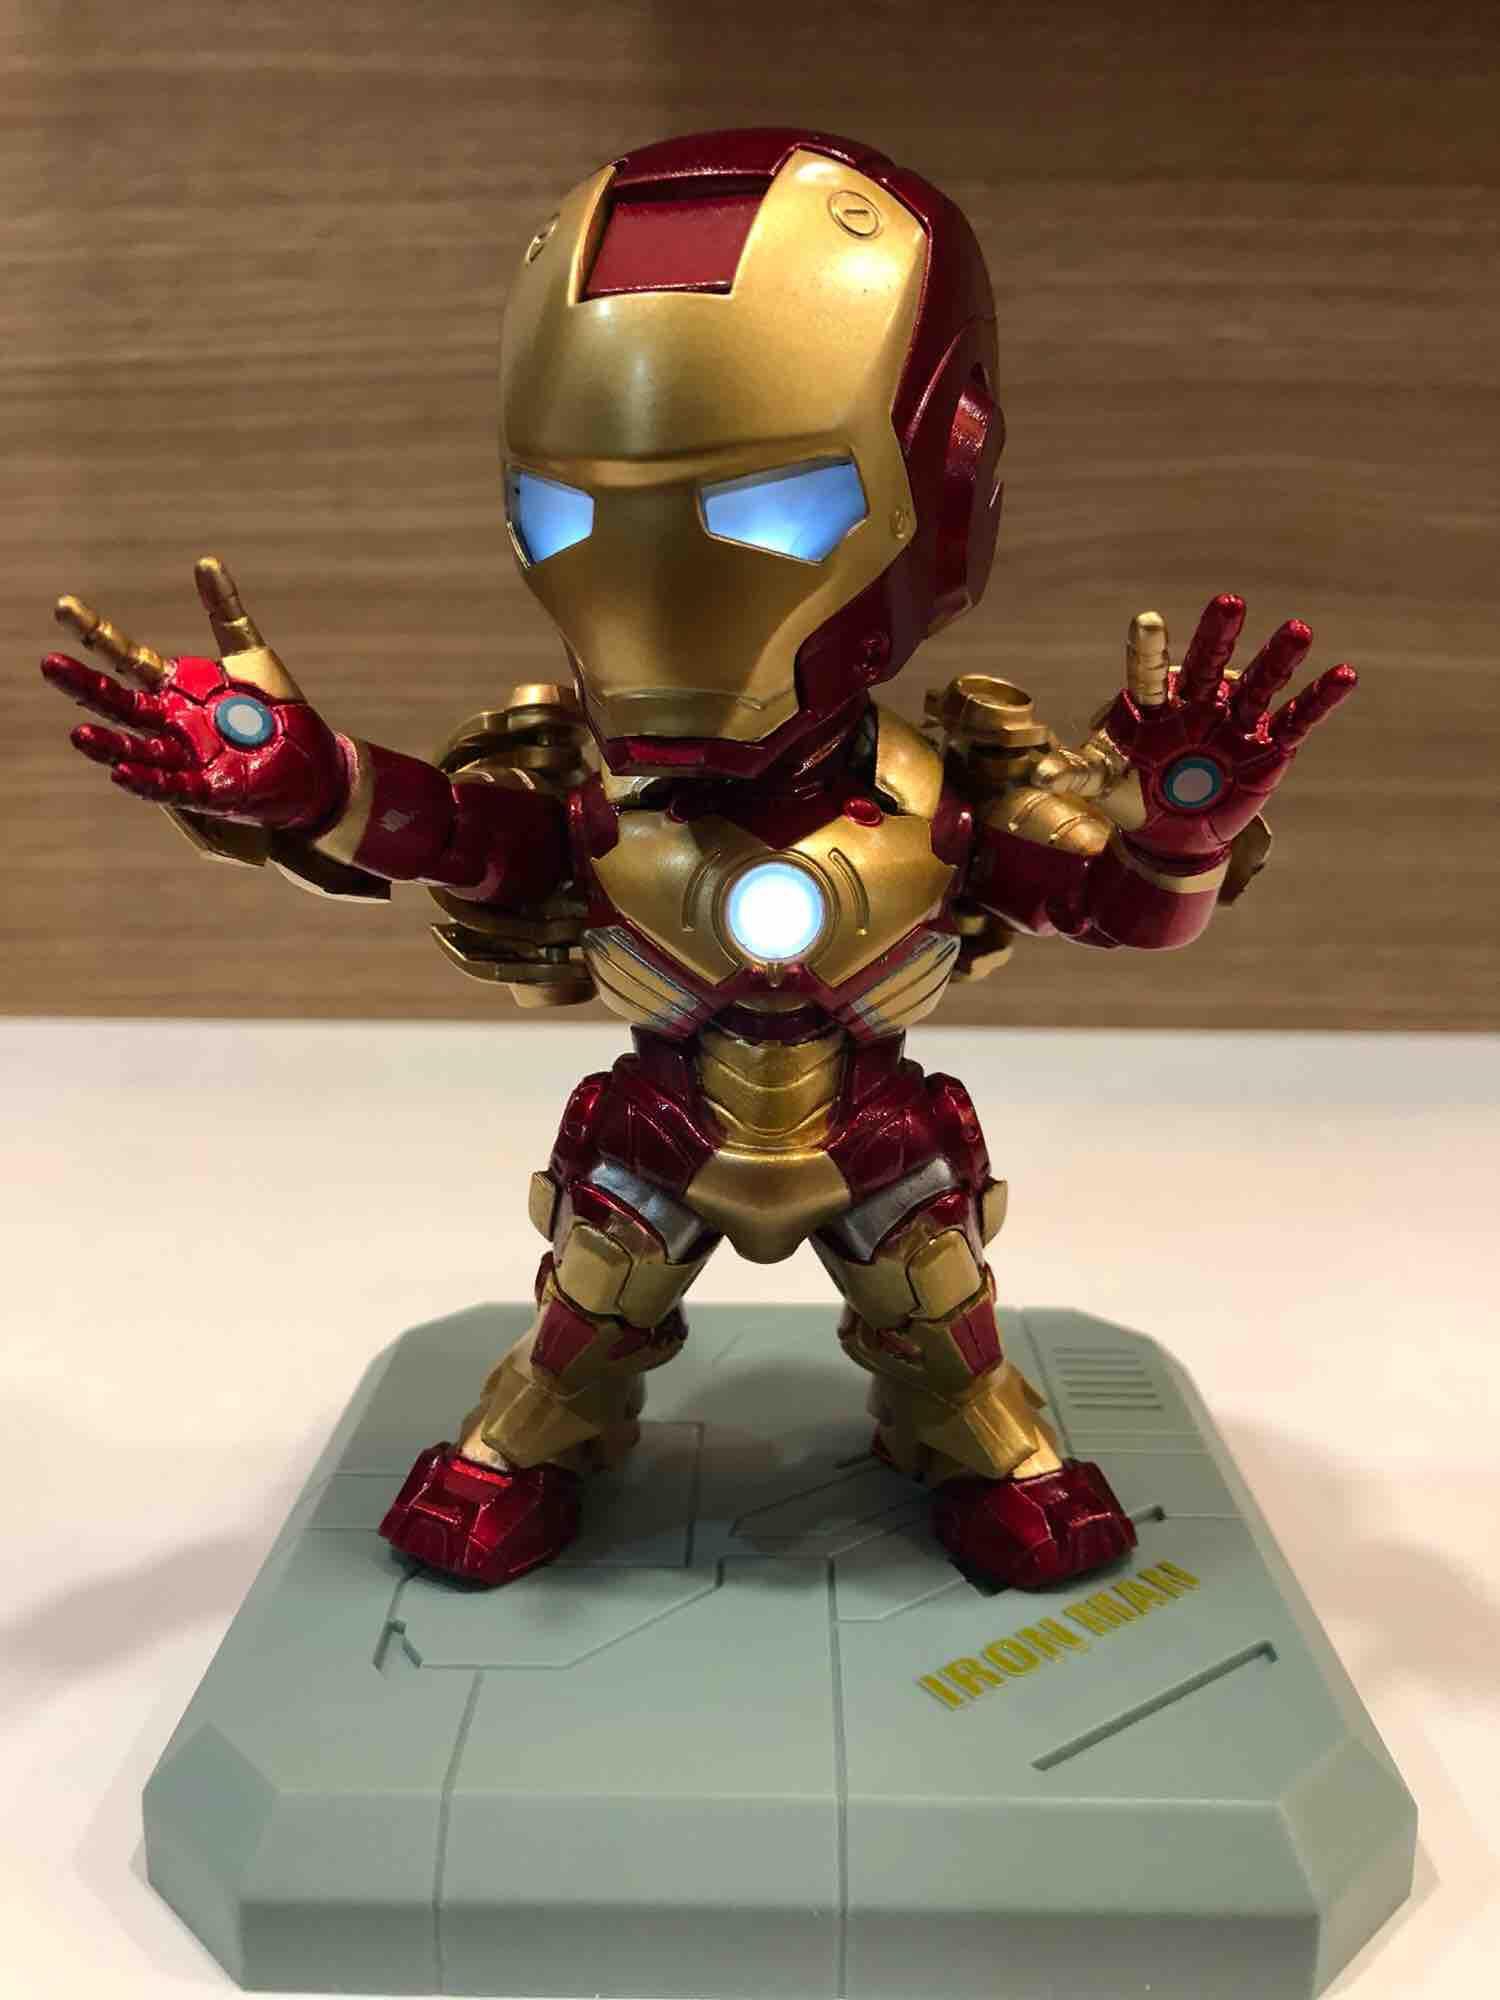 Marvel Legend Iron Man Mark III with LED Light